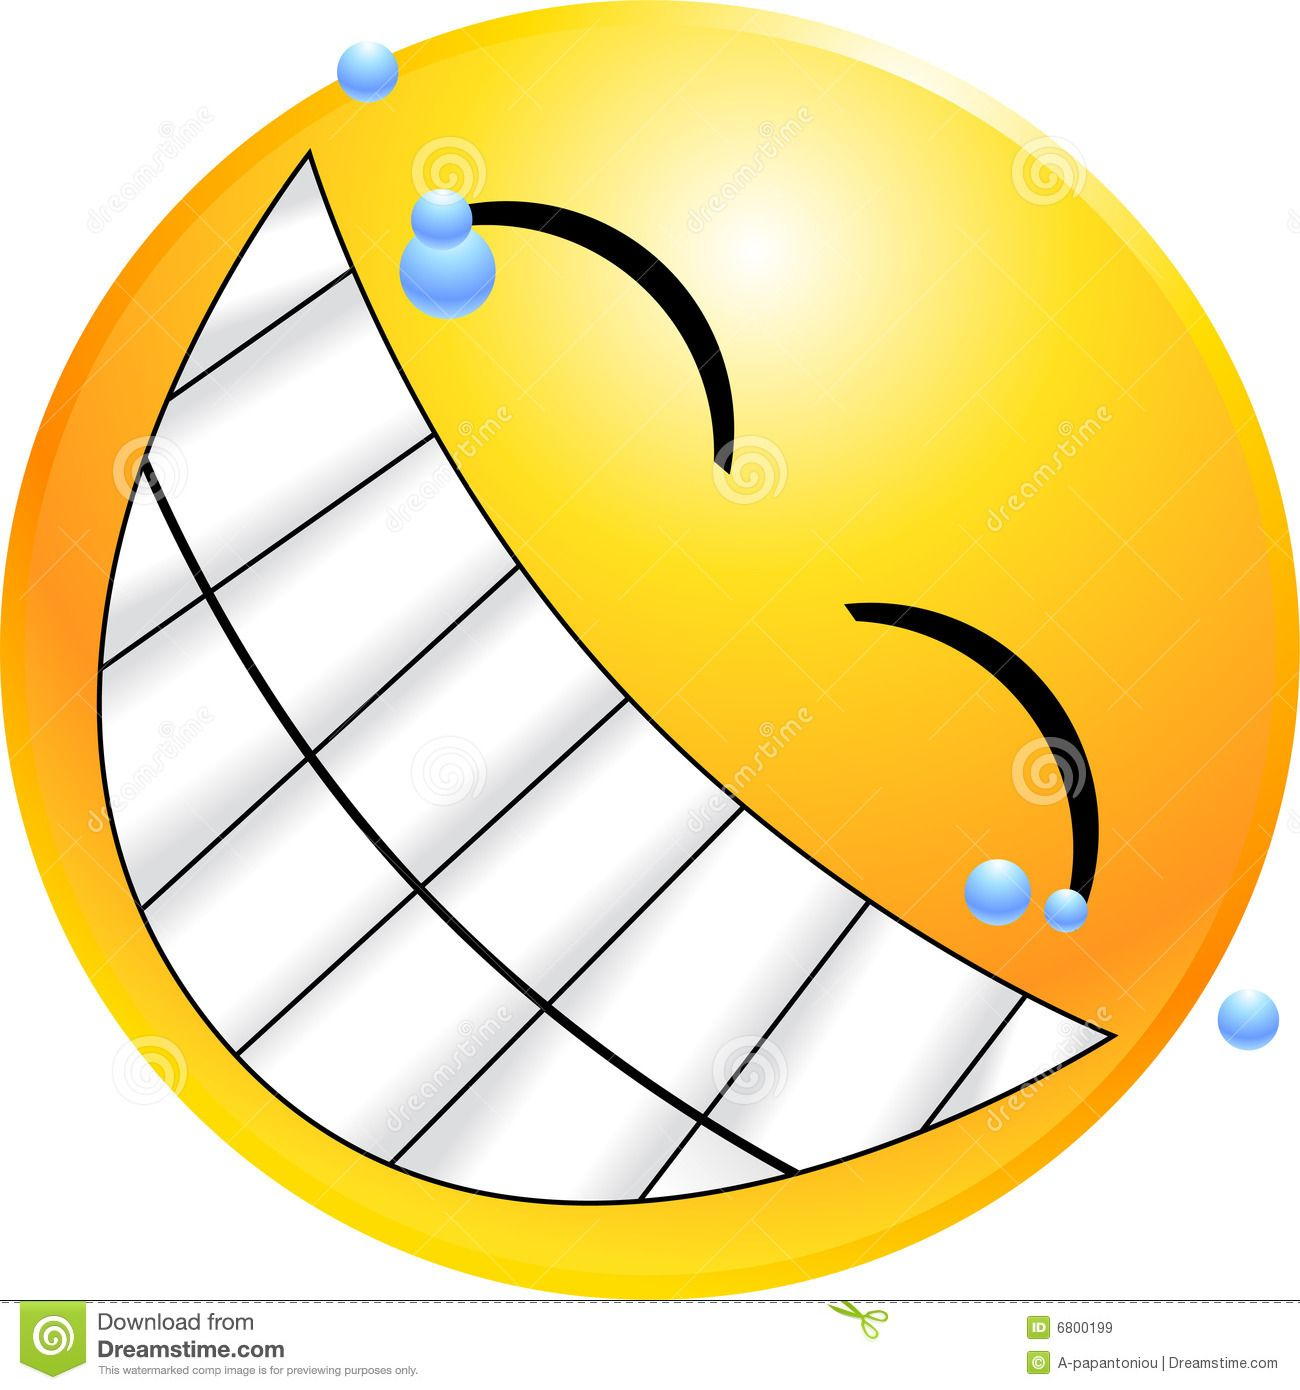 medium resolution of emoticon smiley face stock photos 4 714 emoticon smiley face